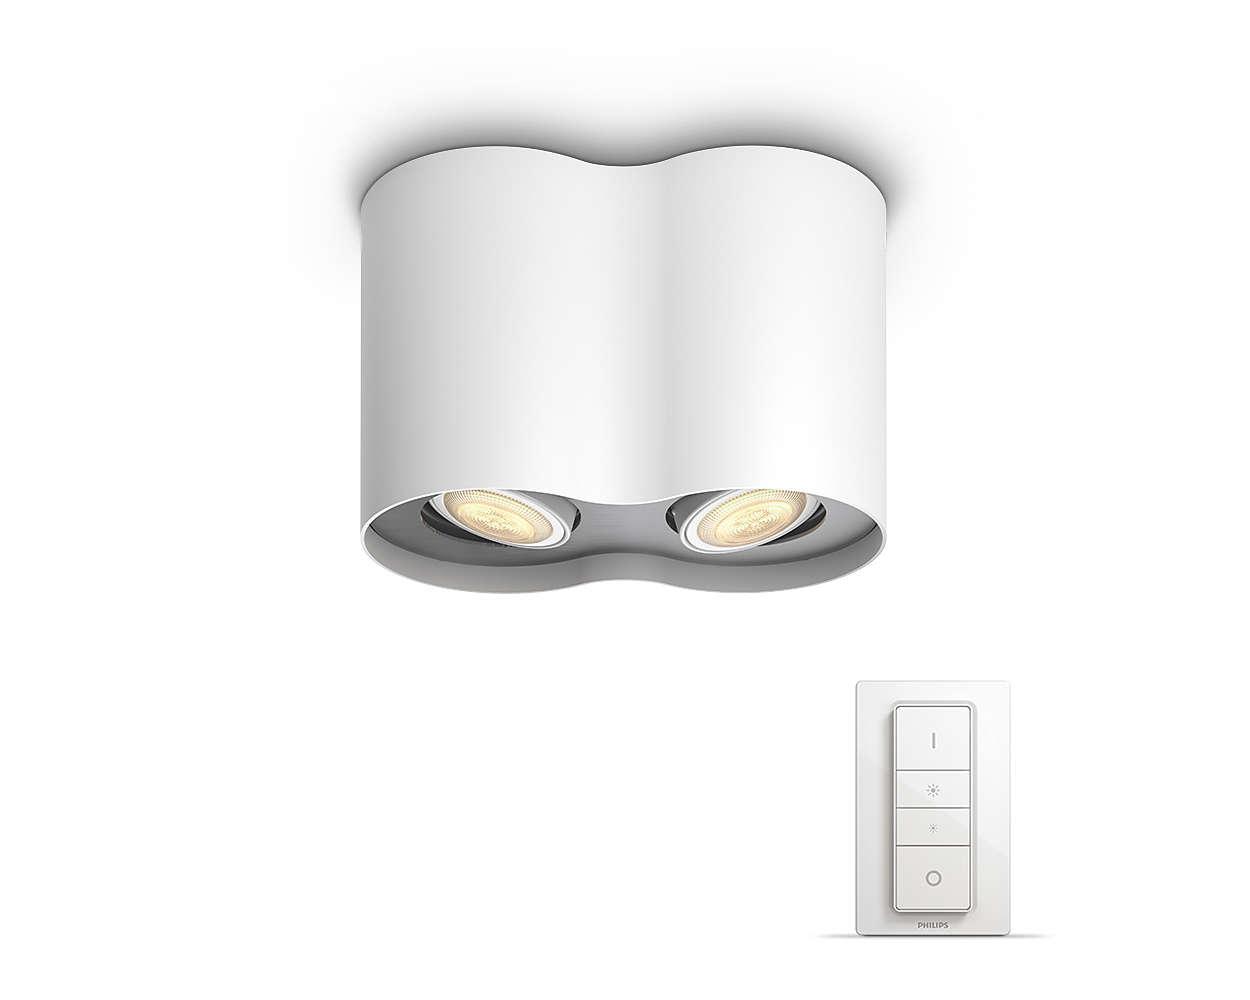 pillar huespot white 2x50w philips hue. Black Bedroom Furniture Sets. Home Design Ideas